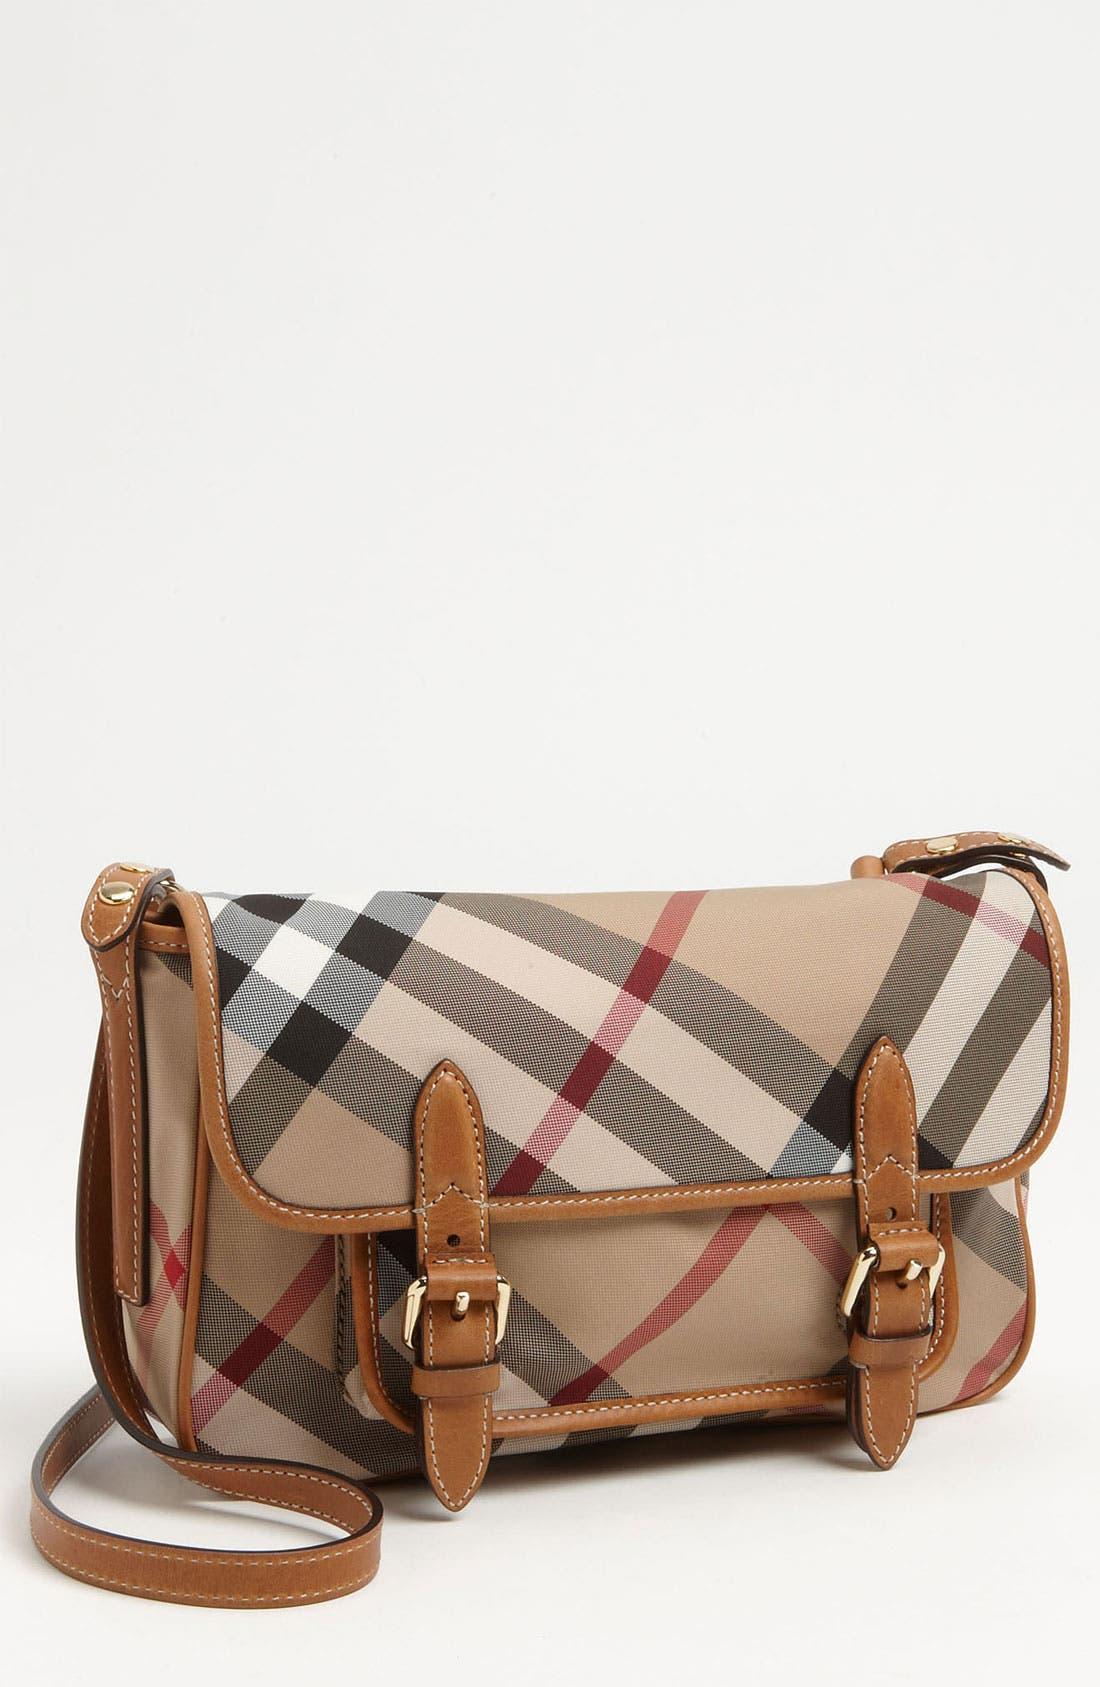 Alternate Image 1 Selected - Burberry 'Liv' Check Print Crossbody Bag (Girls)